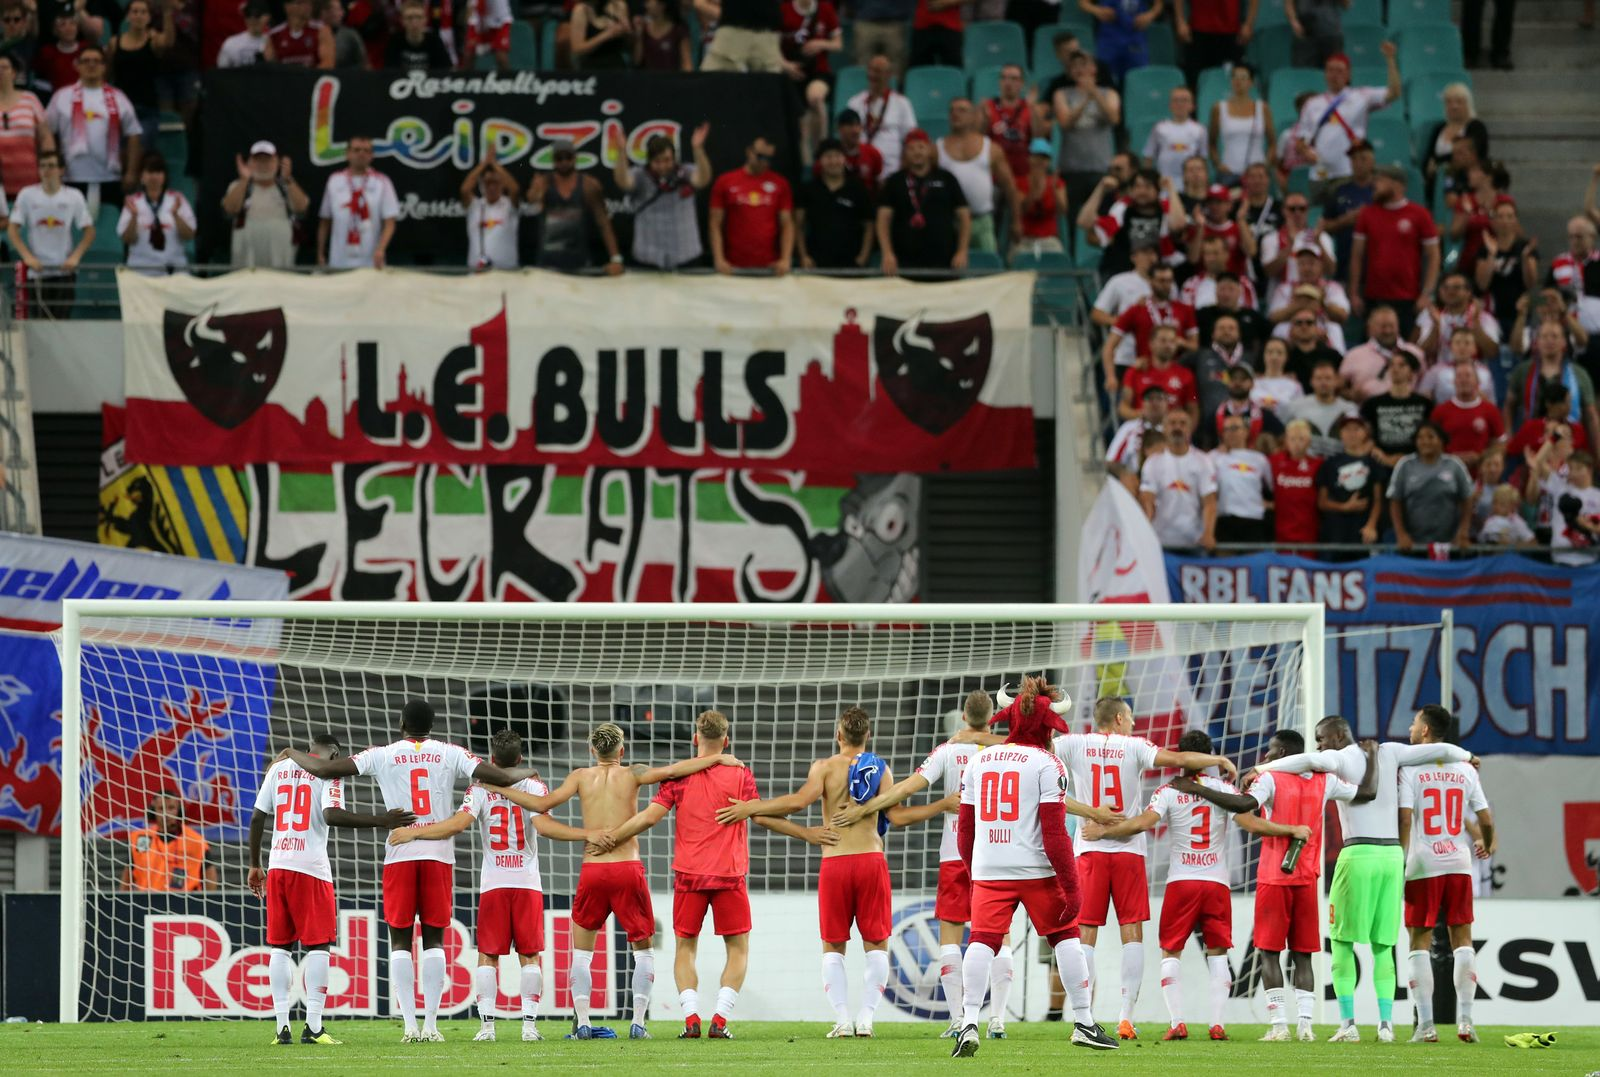 RB Leipzig - CS Universitatea Craiova 3:1